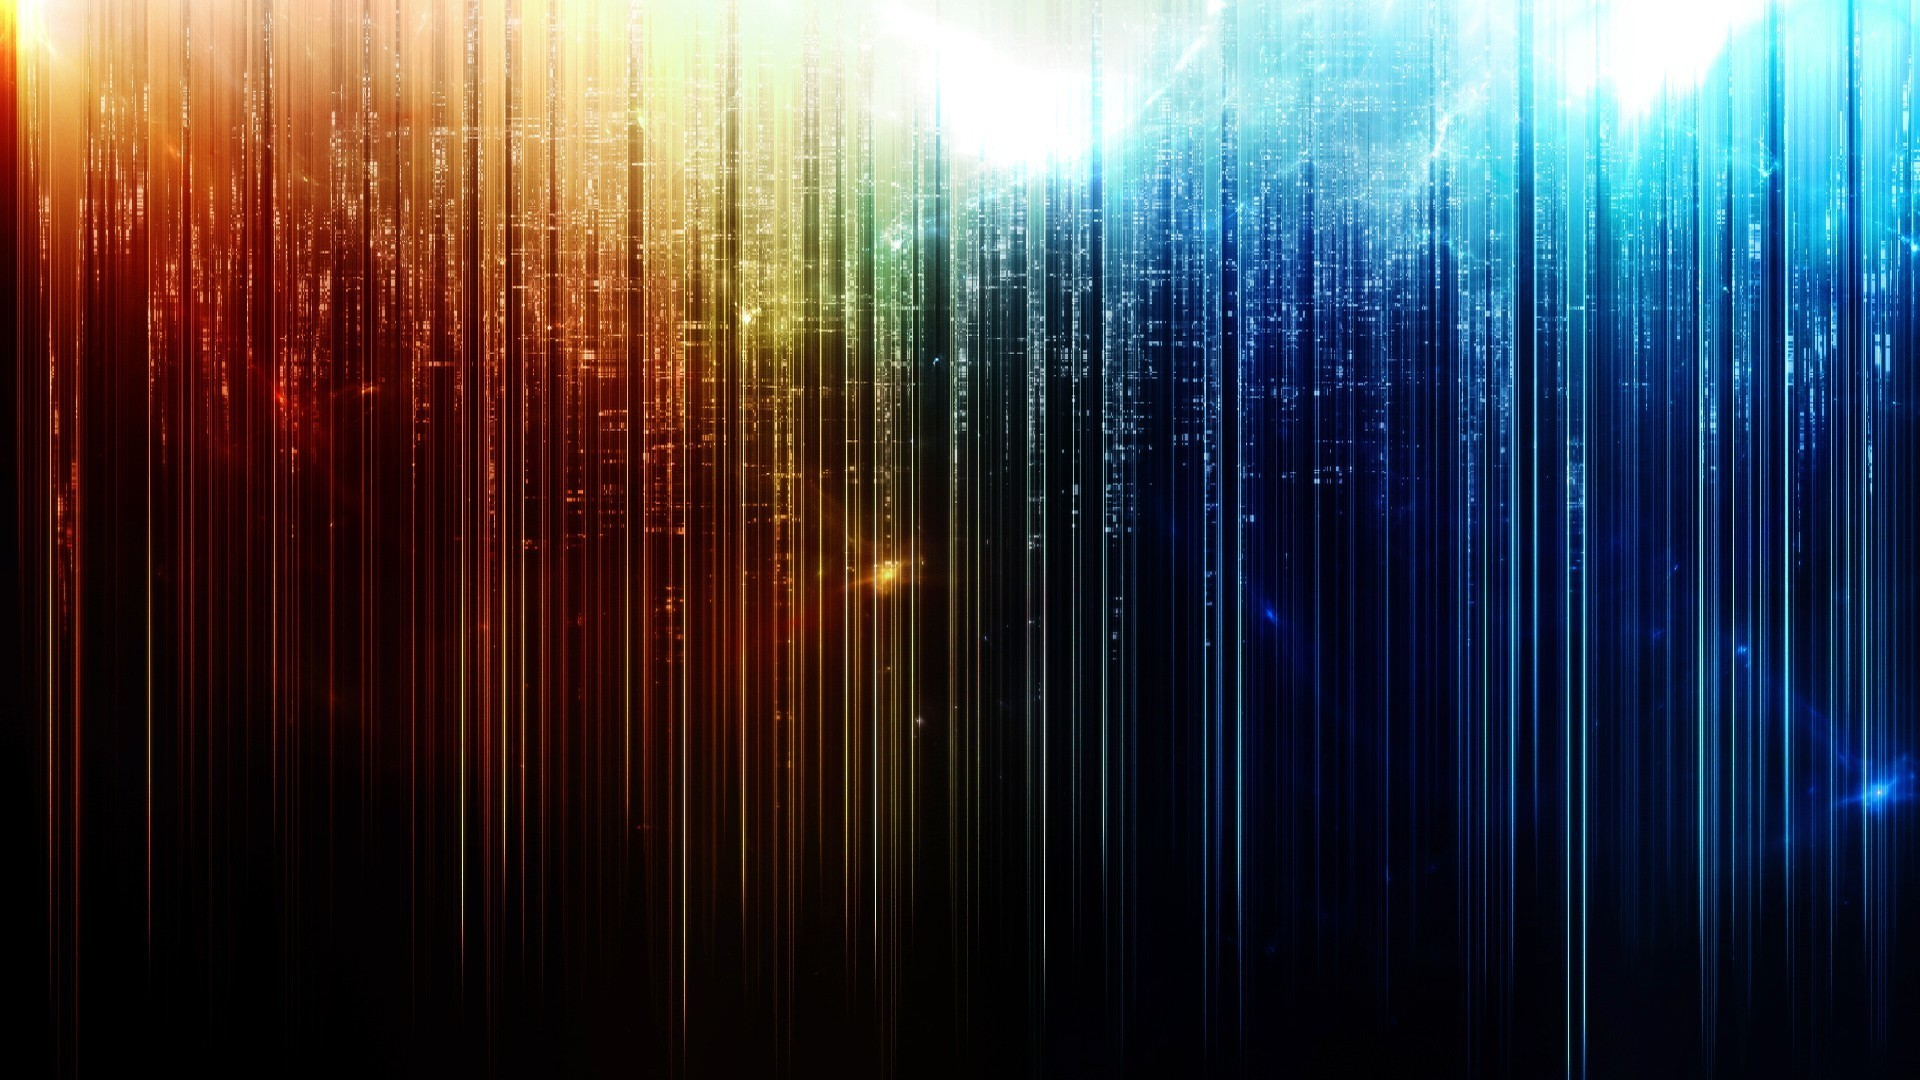 Wallpaper :: [wall.alphacoders.com] Abstract – Light.